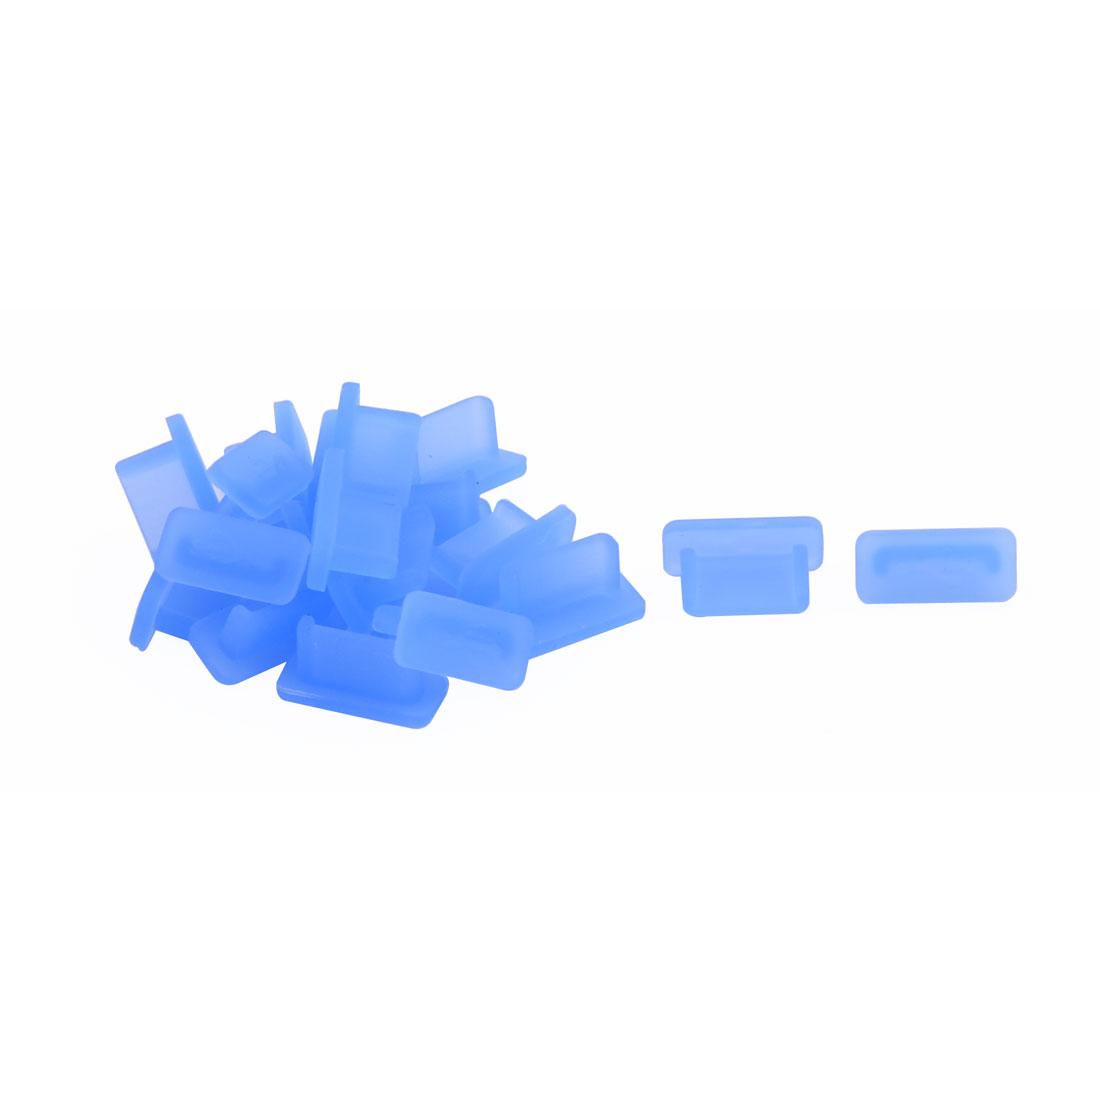 PC Phone Rubber Female Port Anti Dust Cover Cap Blue 20pcs for USB Type C